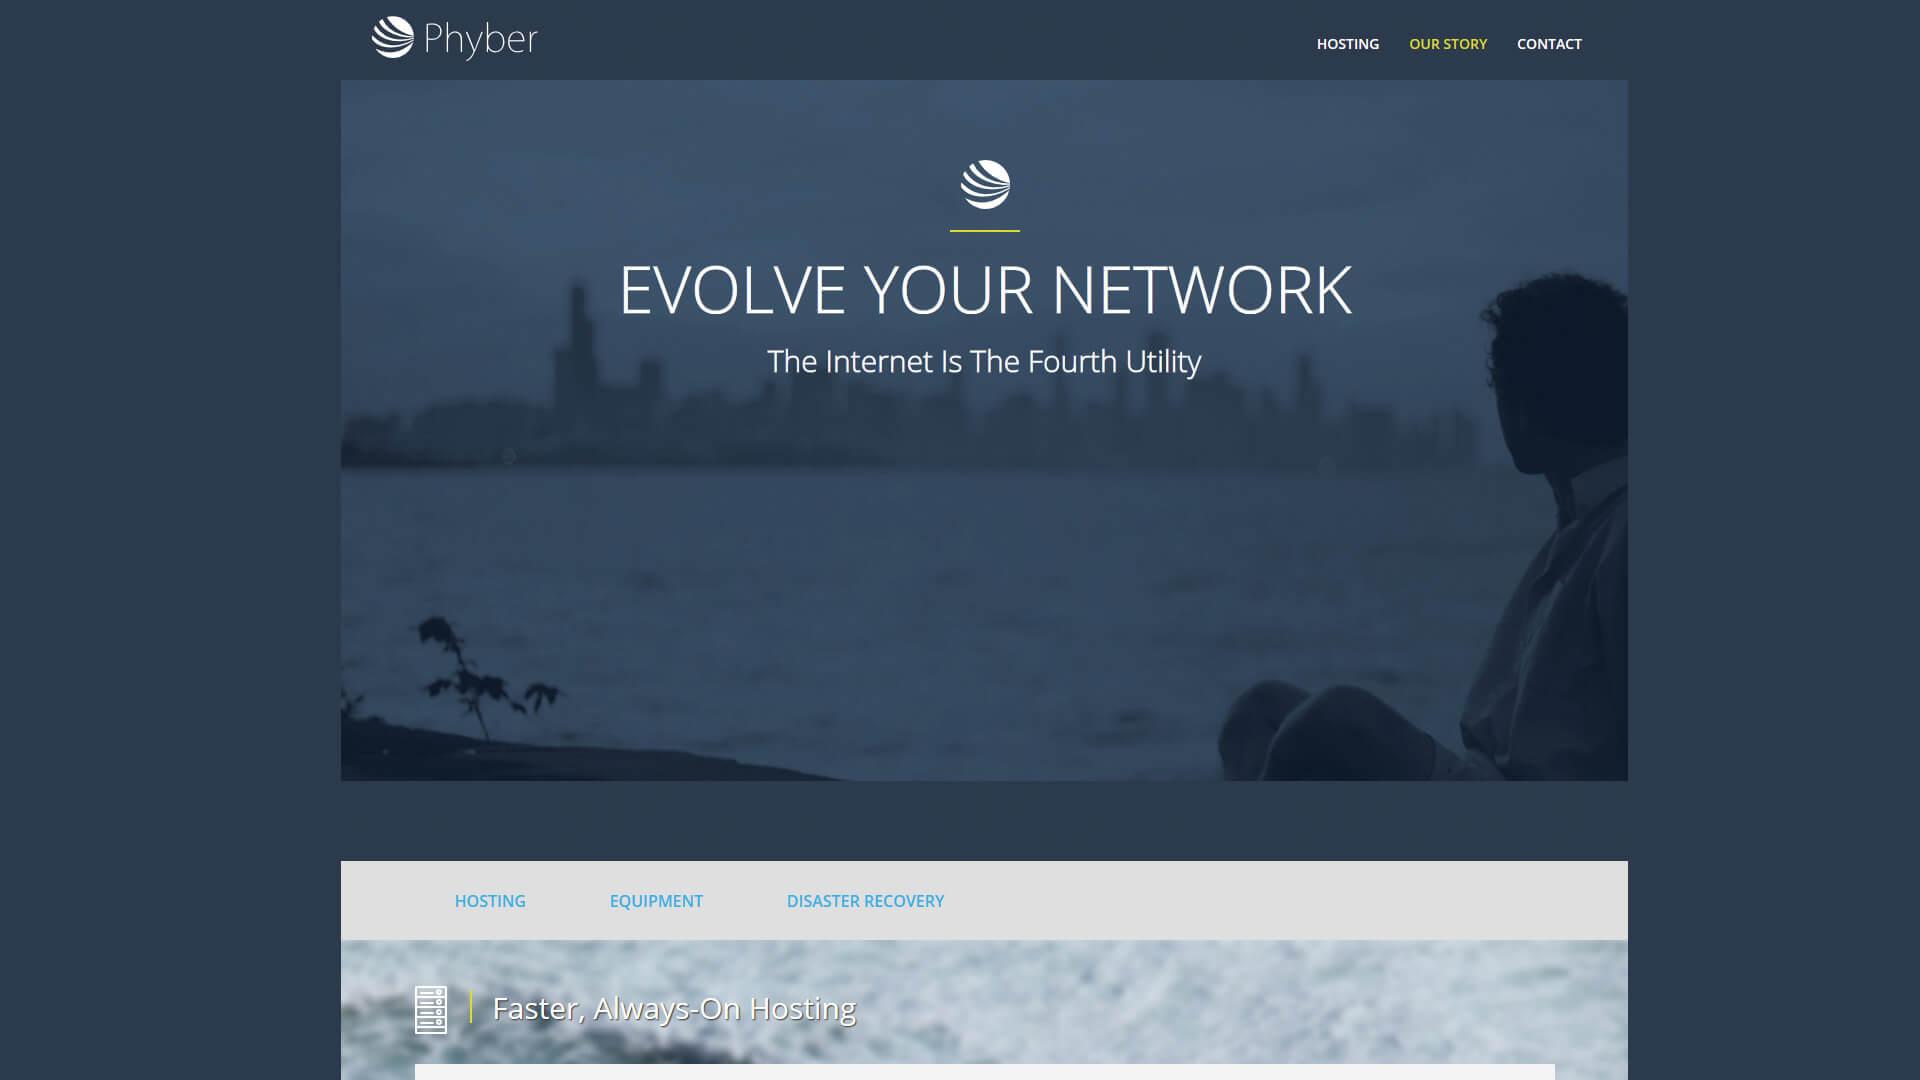 Phyber